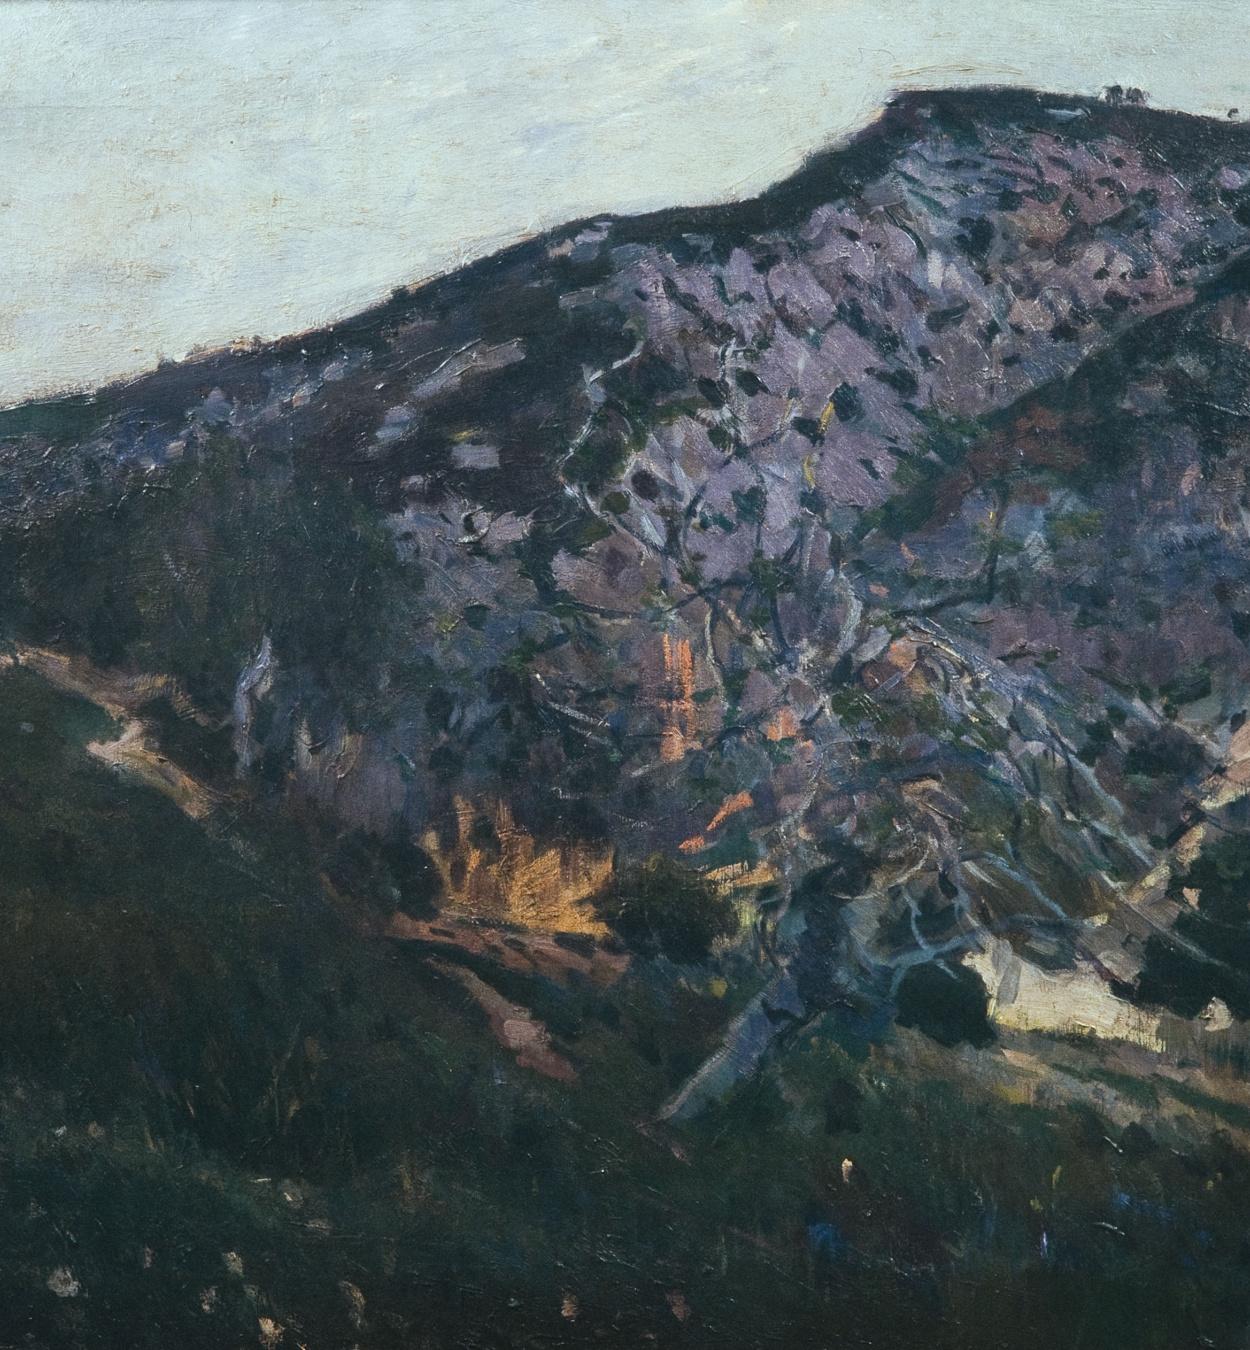 Joaquim Mir - Solitude - Circa 1923